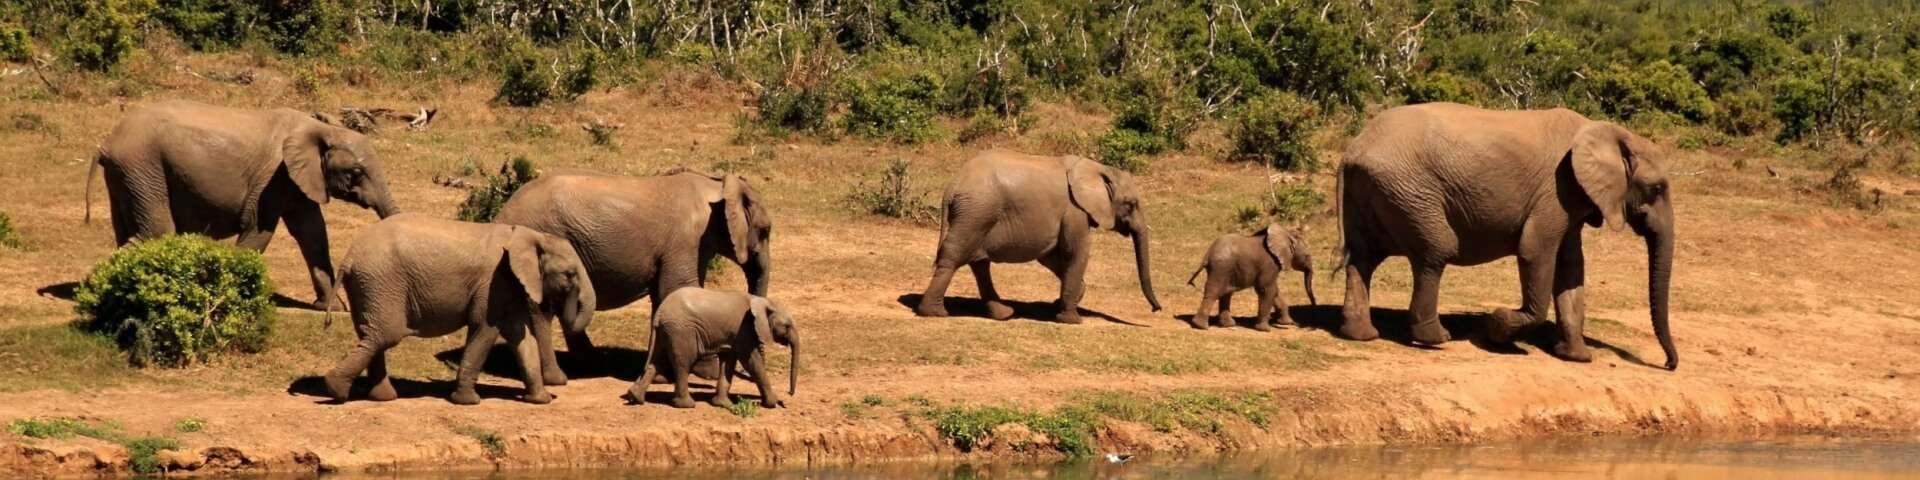 banner dieren uitsterven